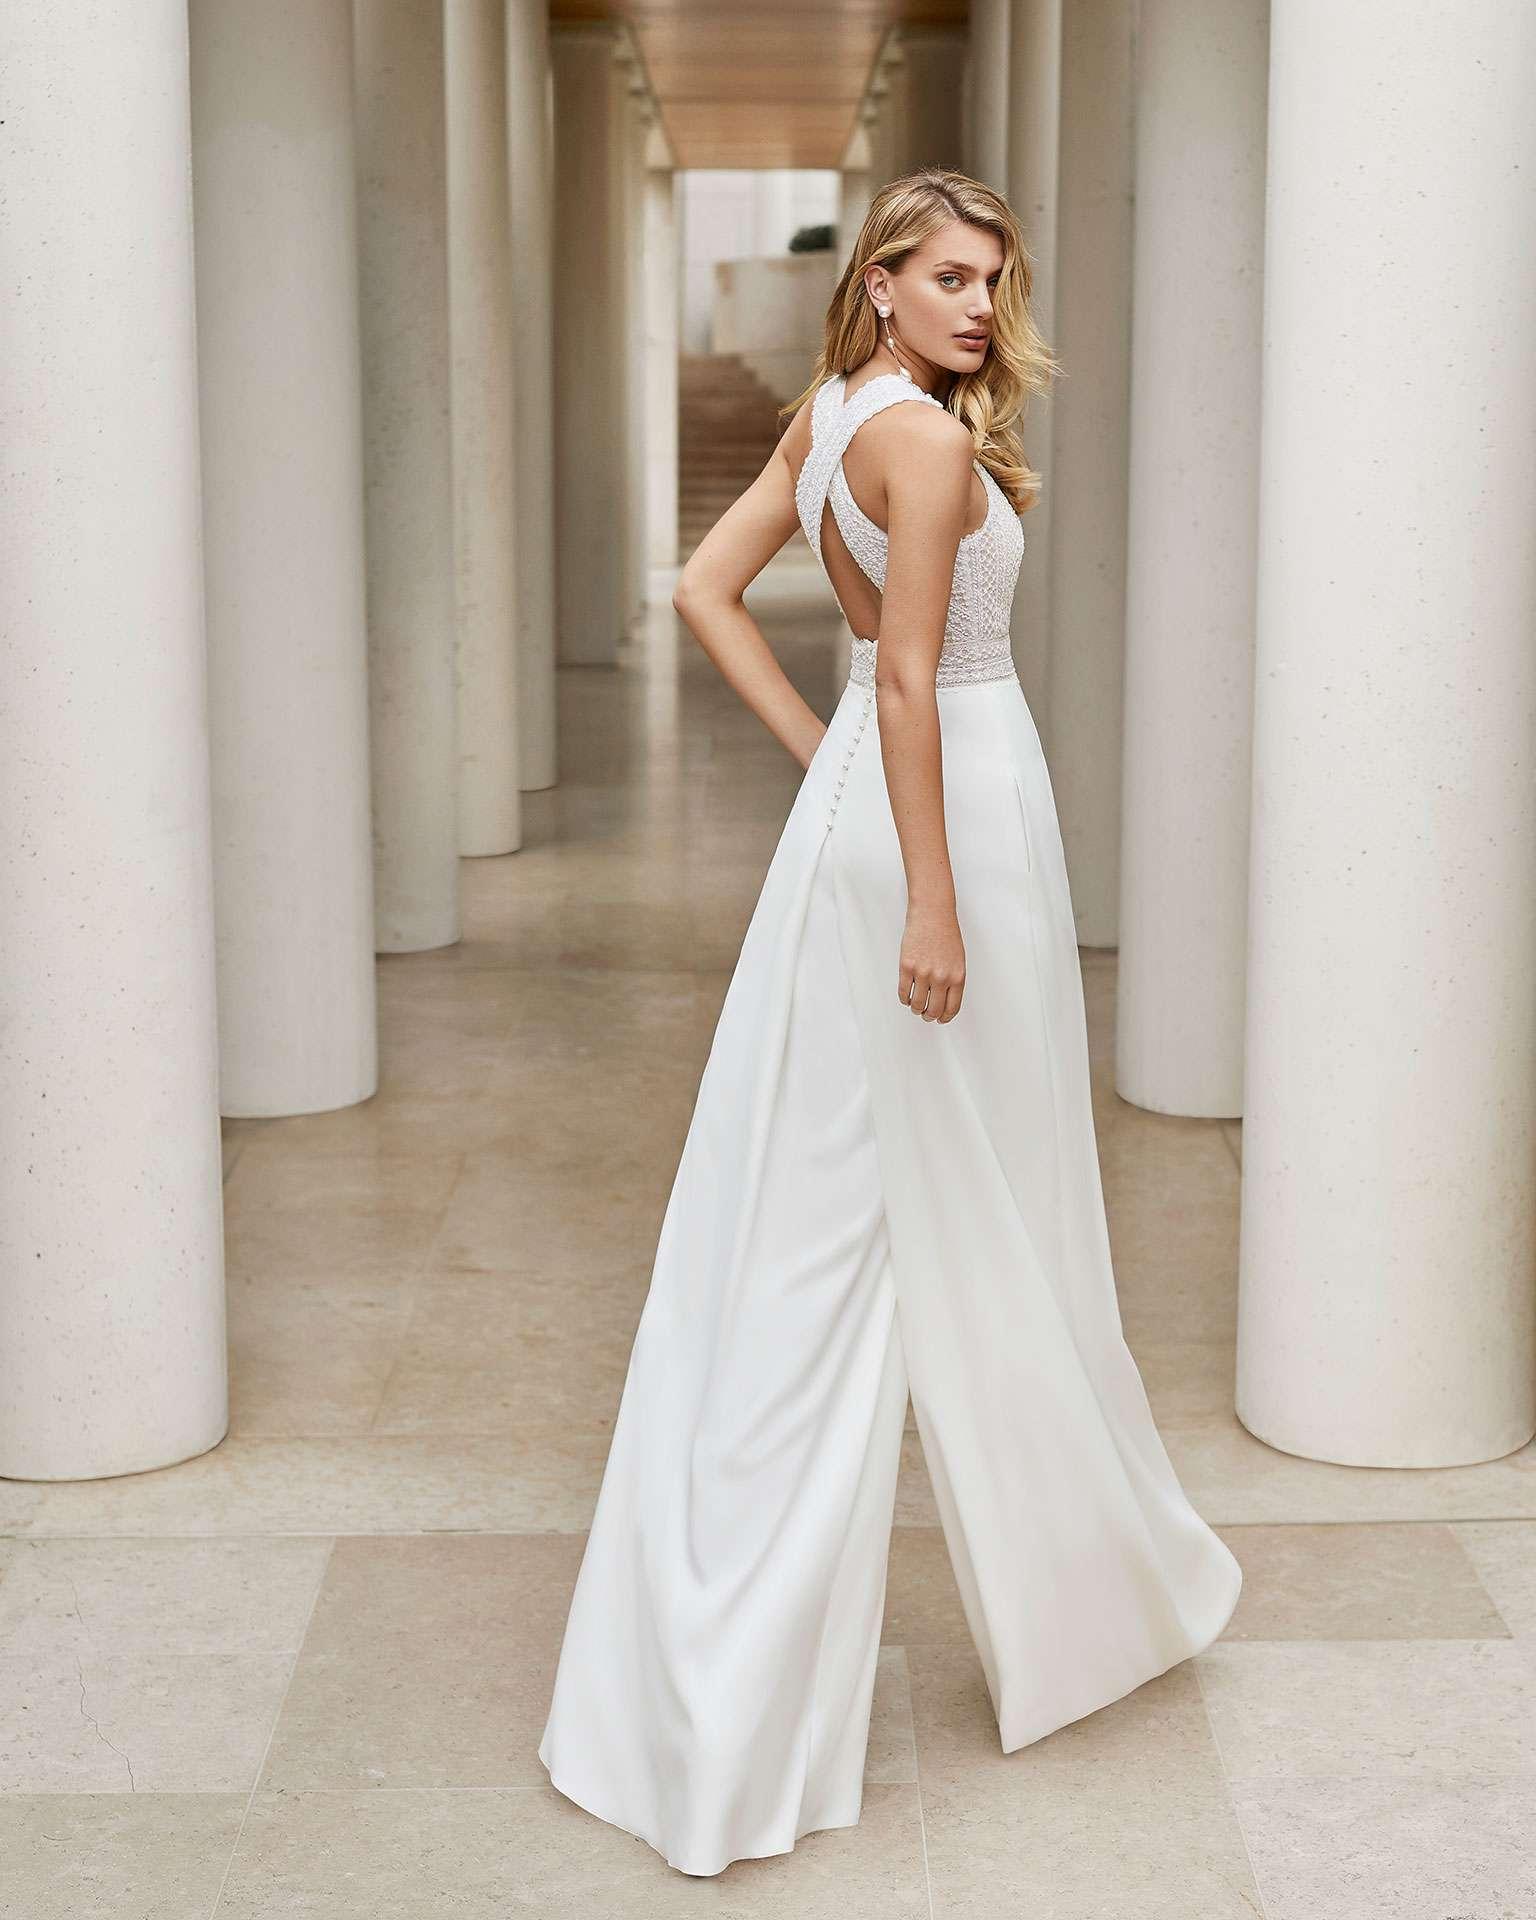 Model in white bridal suit